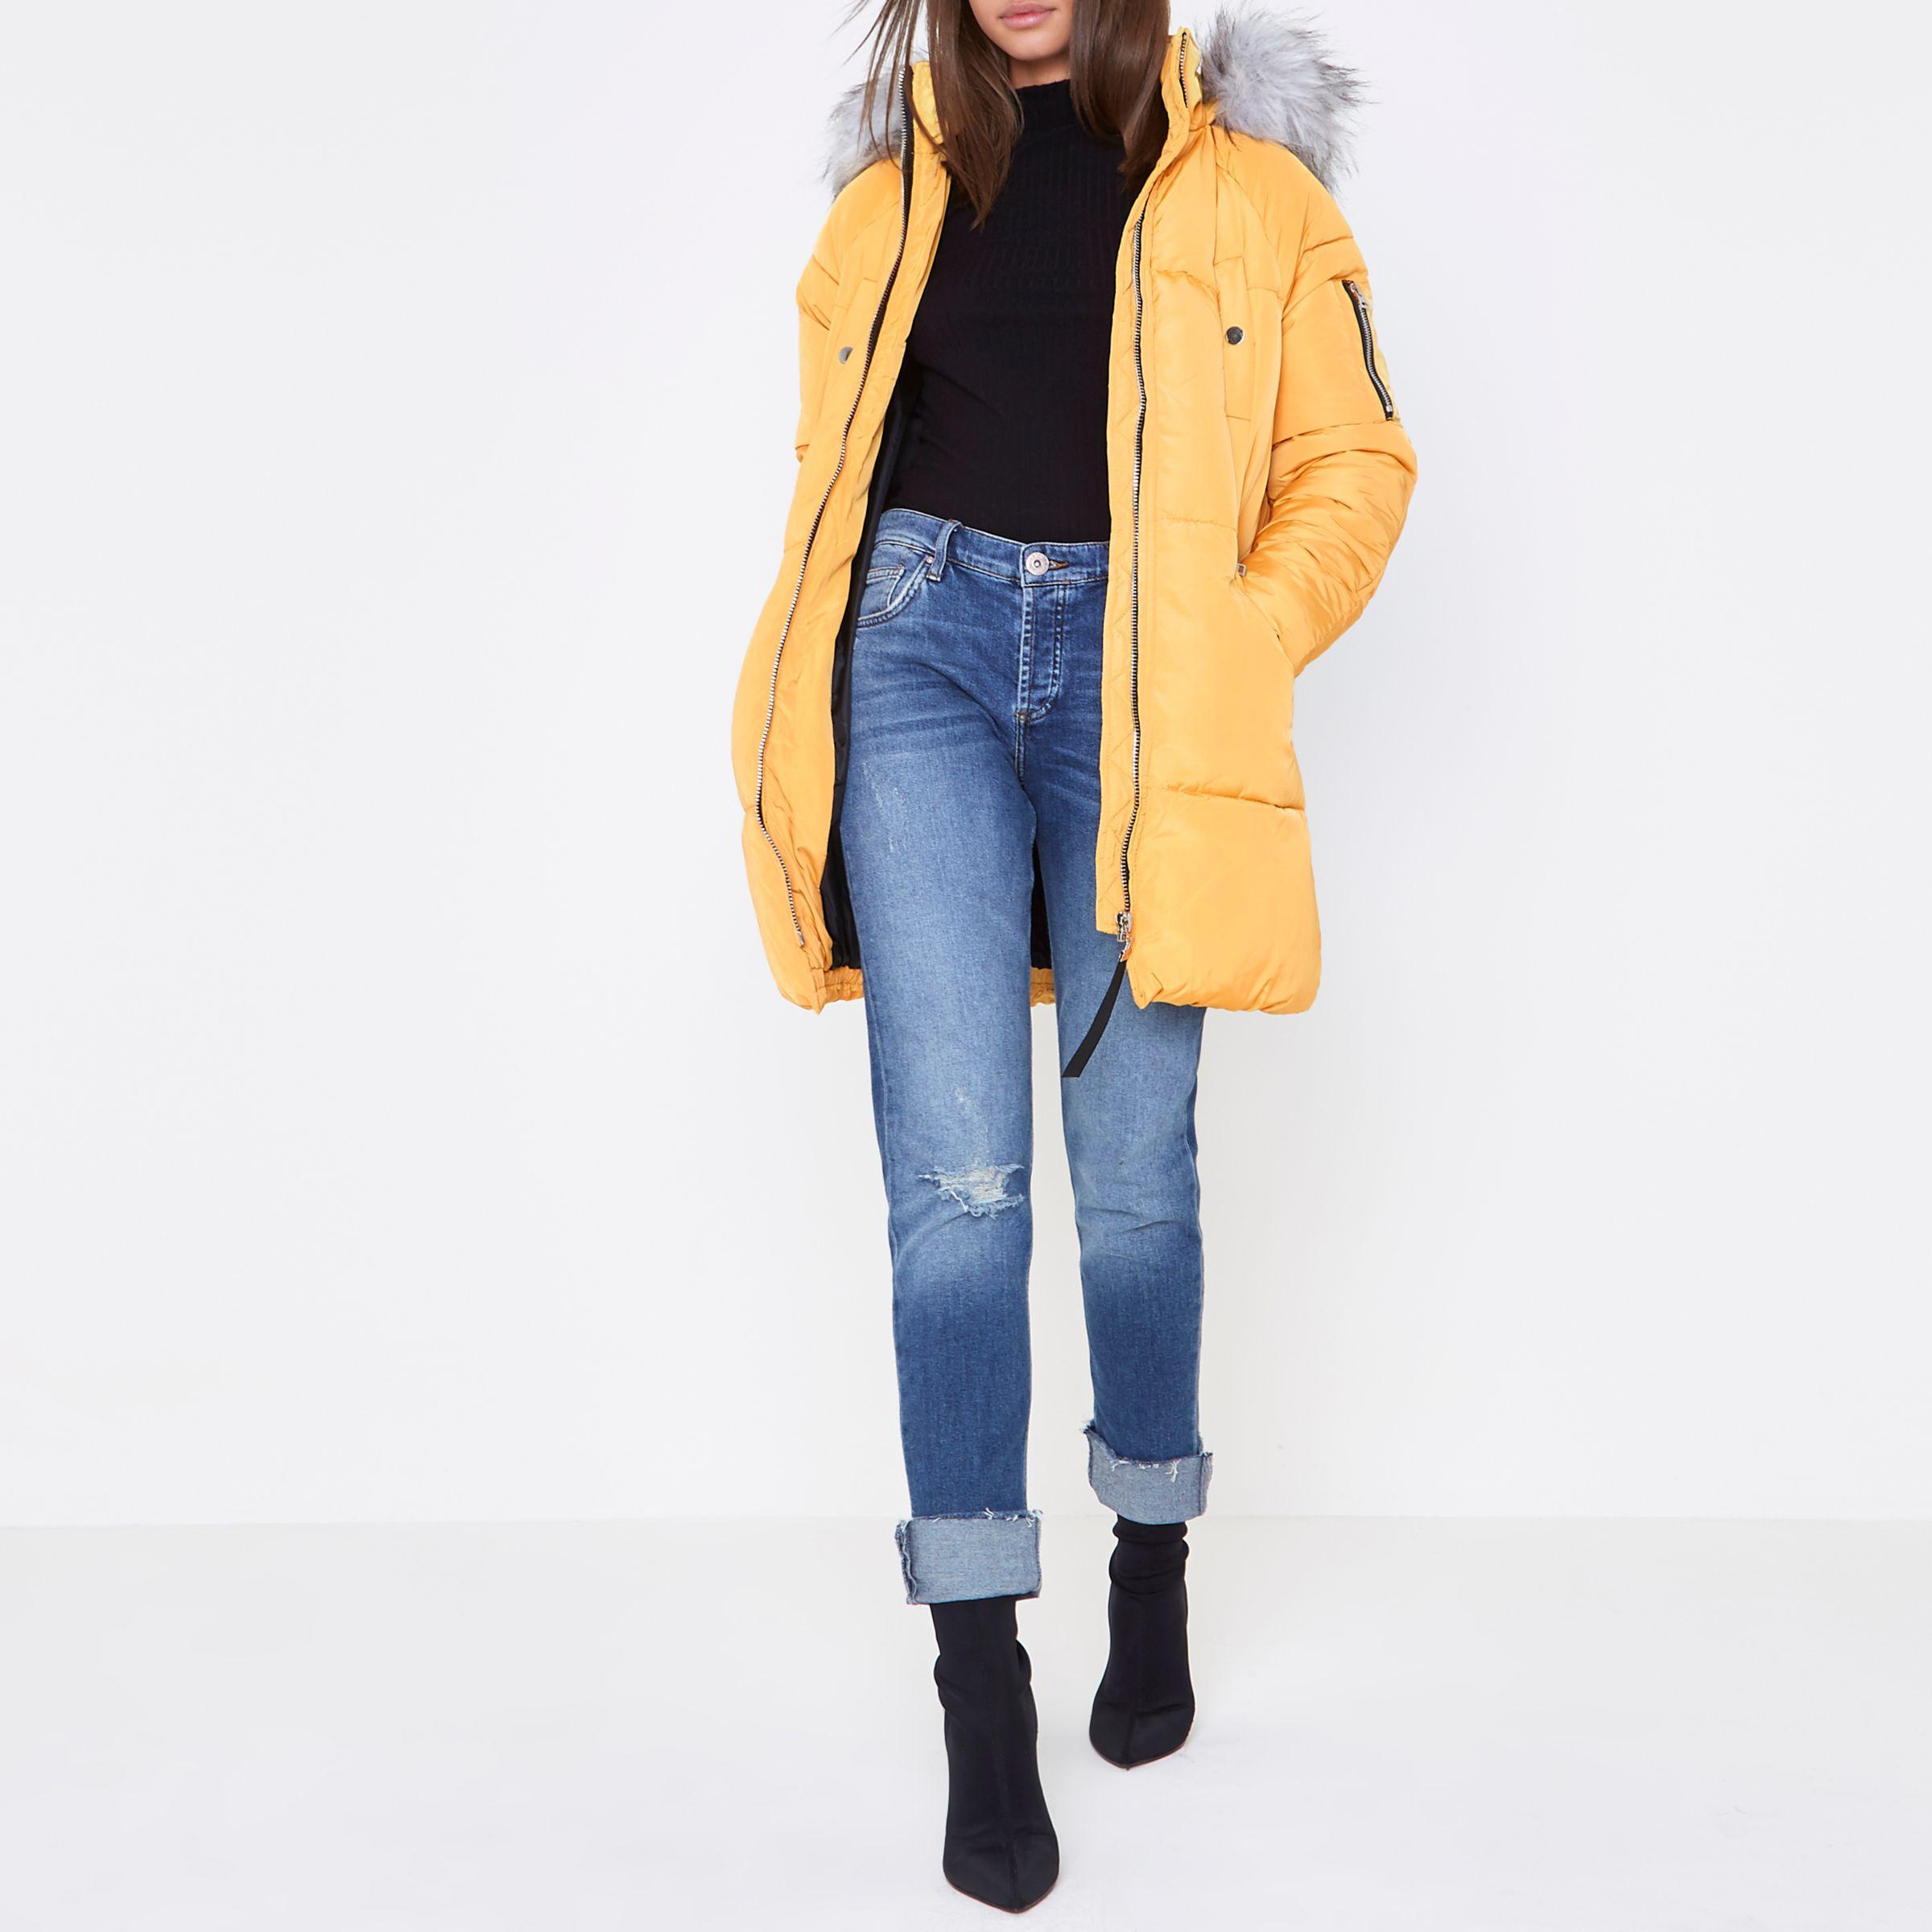 2cae5355995 River Island Yellow Longline Faux Fur Trim Puffer Jacket in Yellow ...